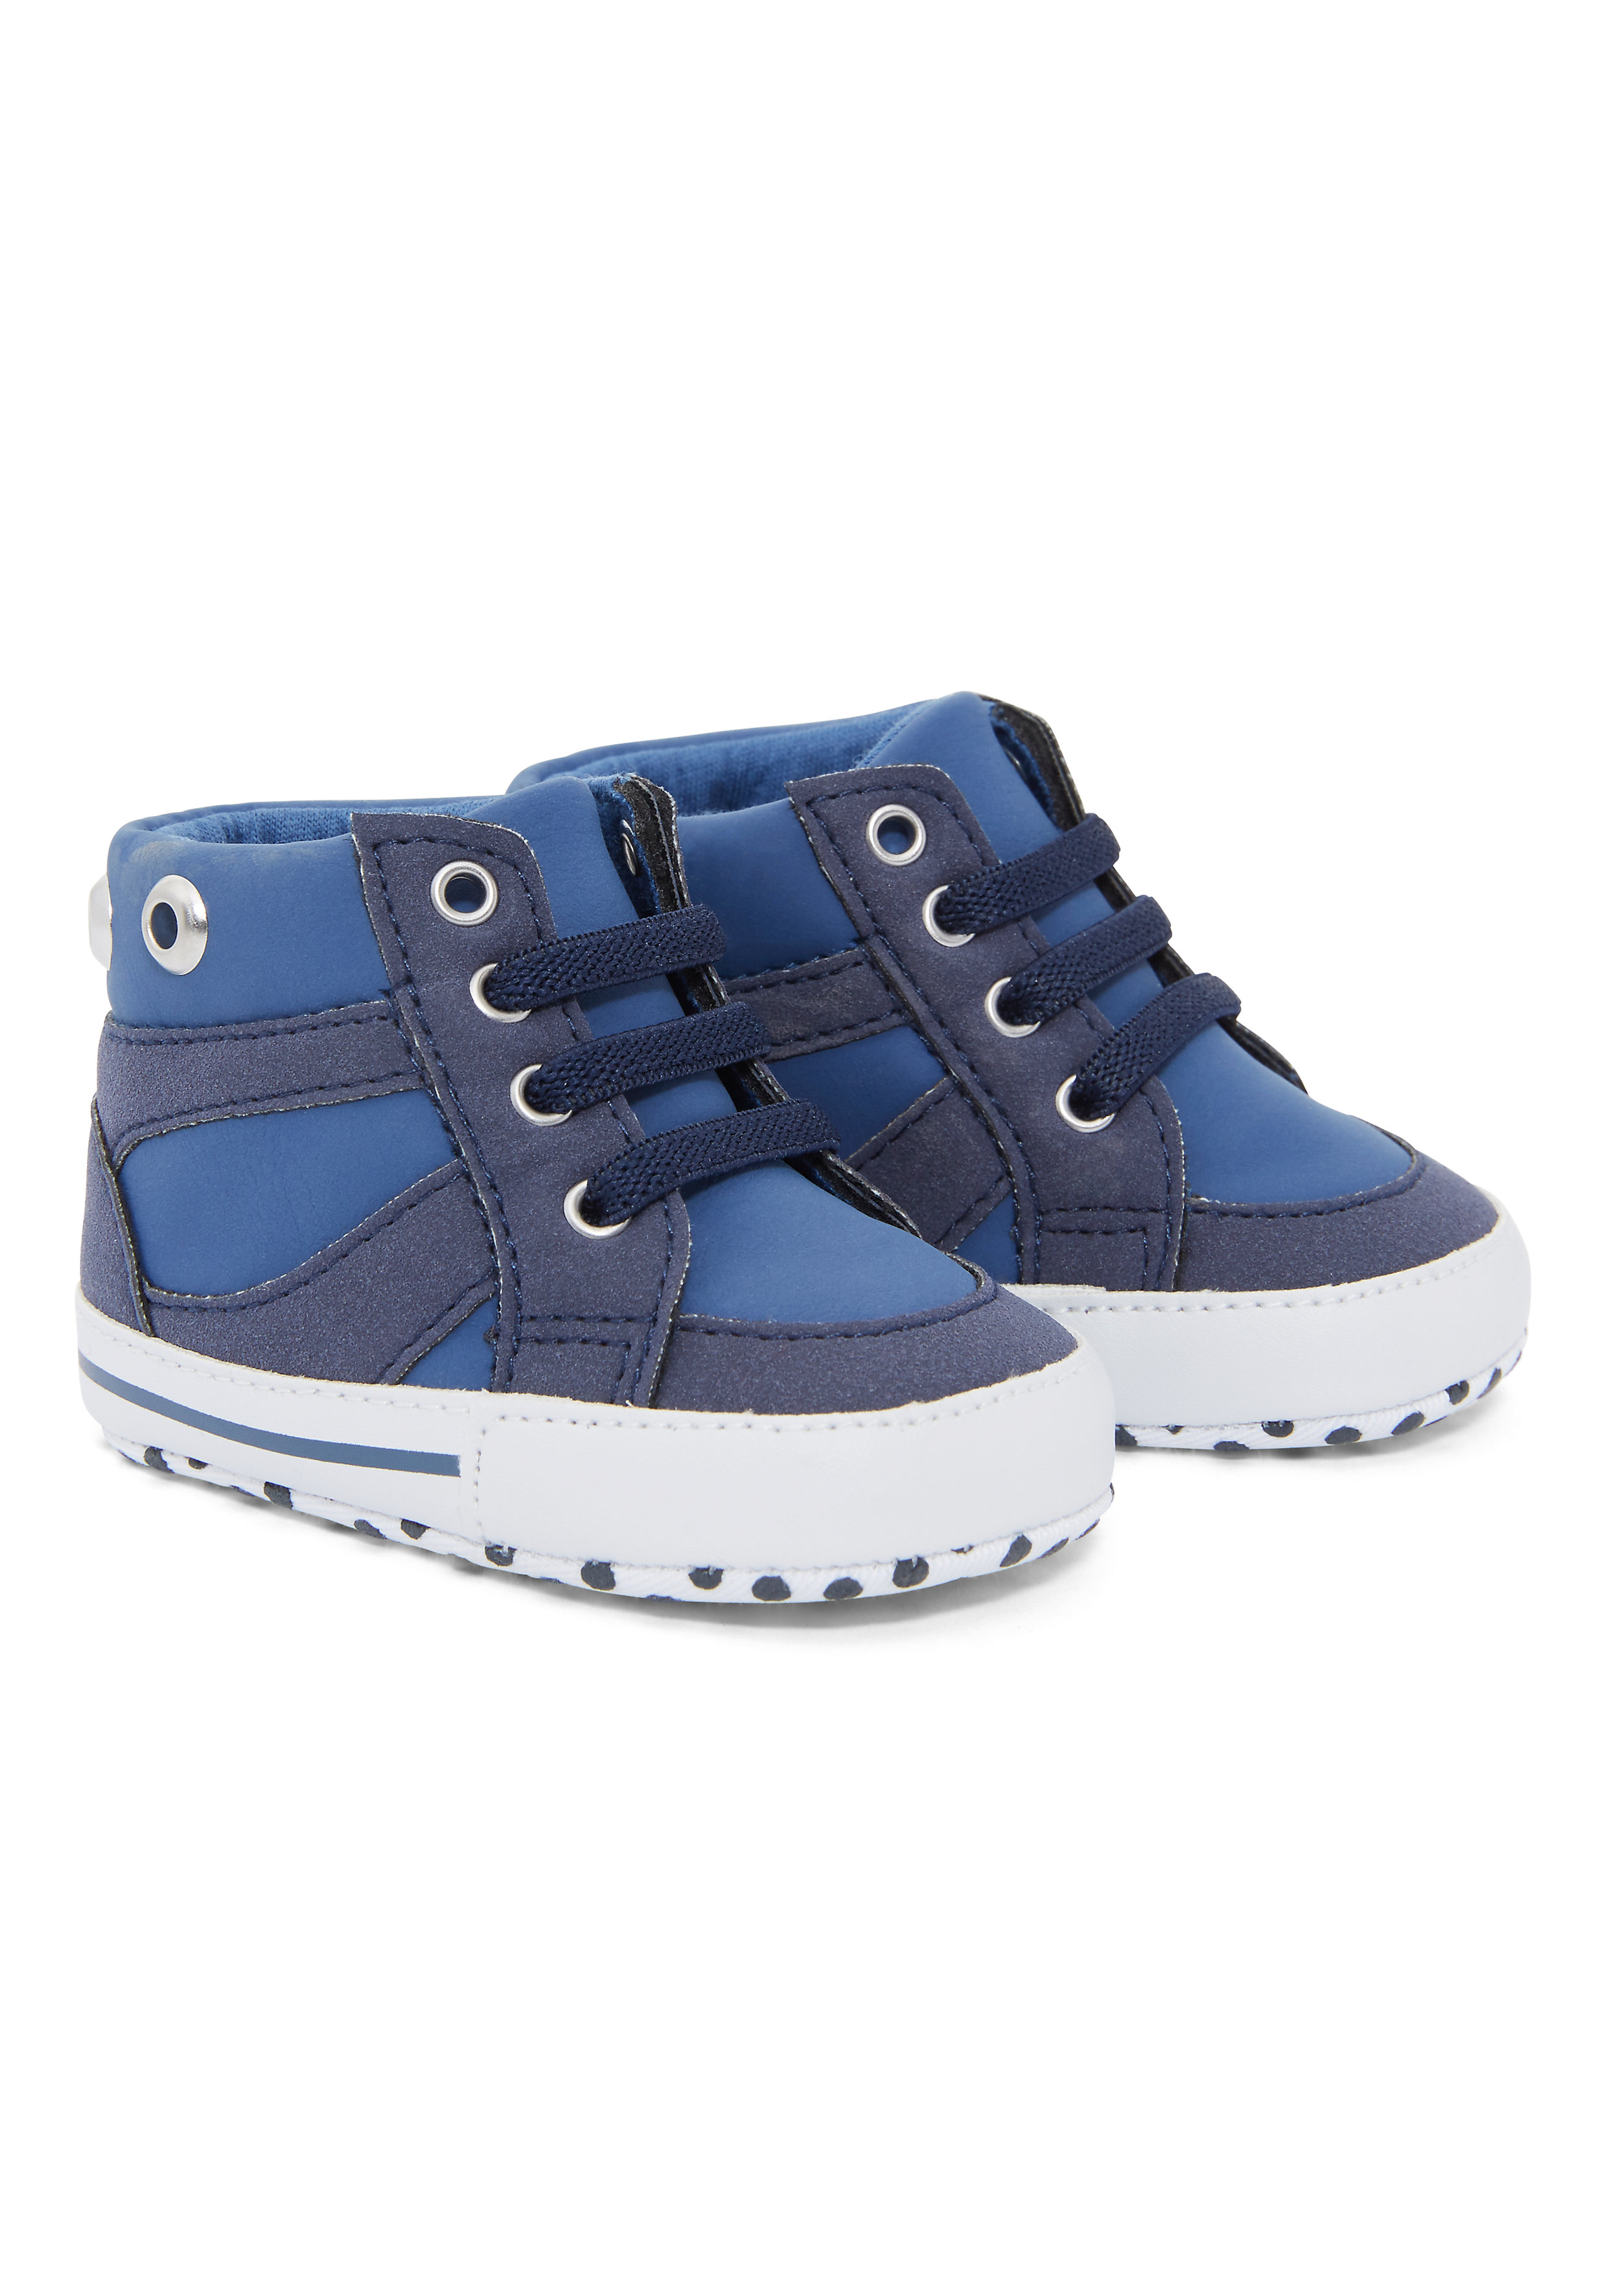 Mothercare | Boys Pram Shoes - Blue